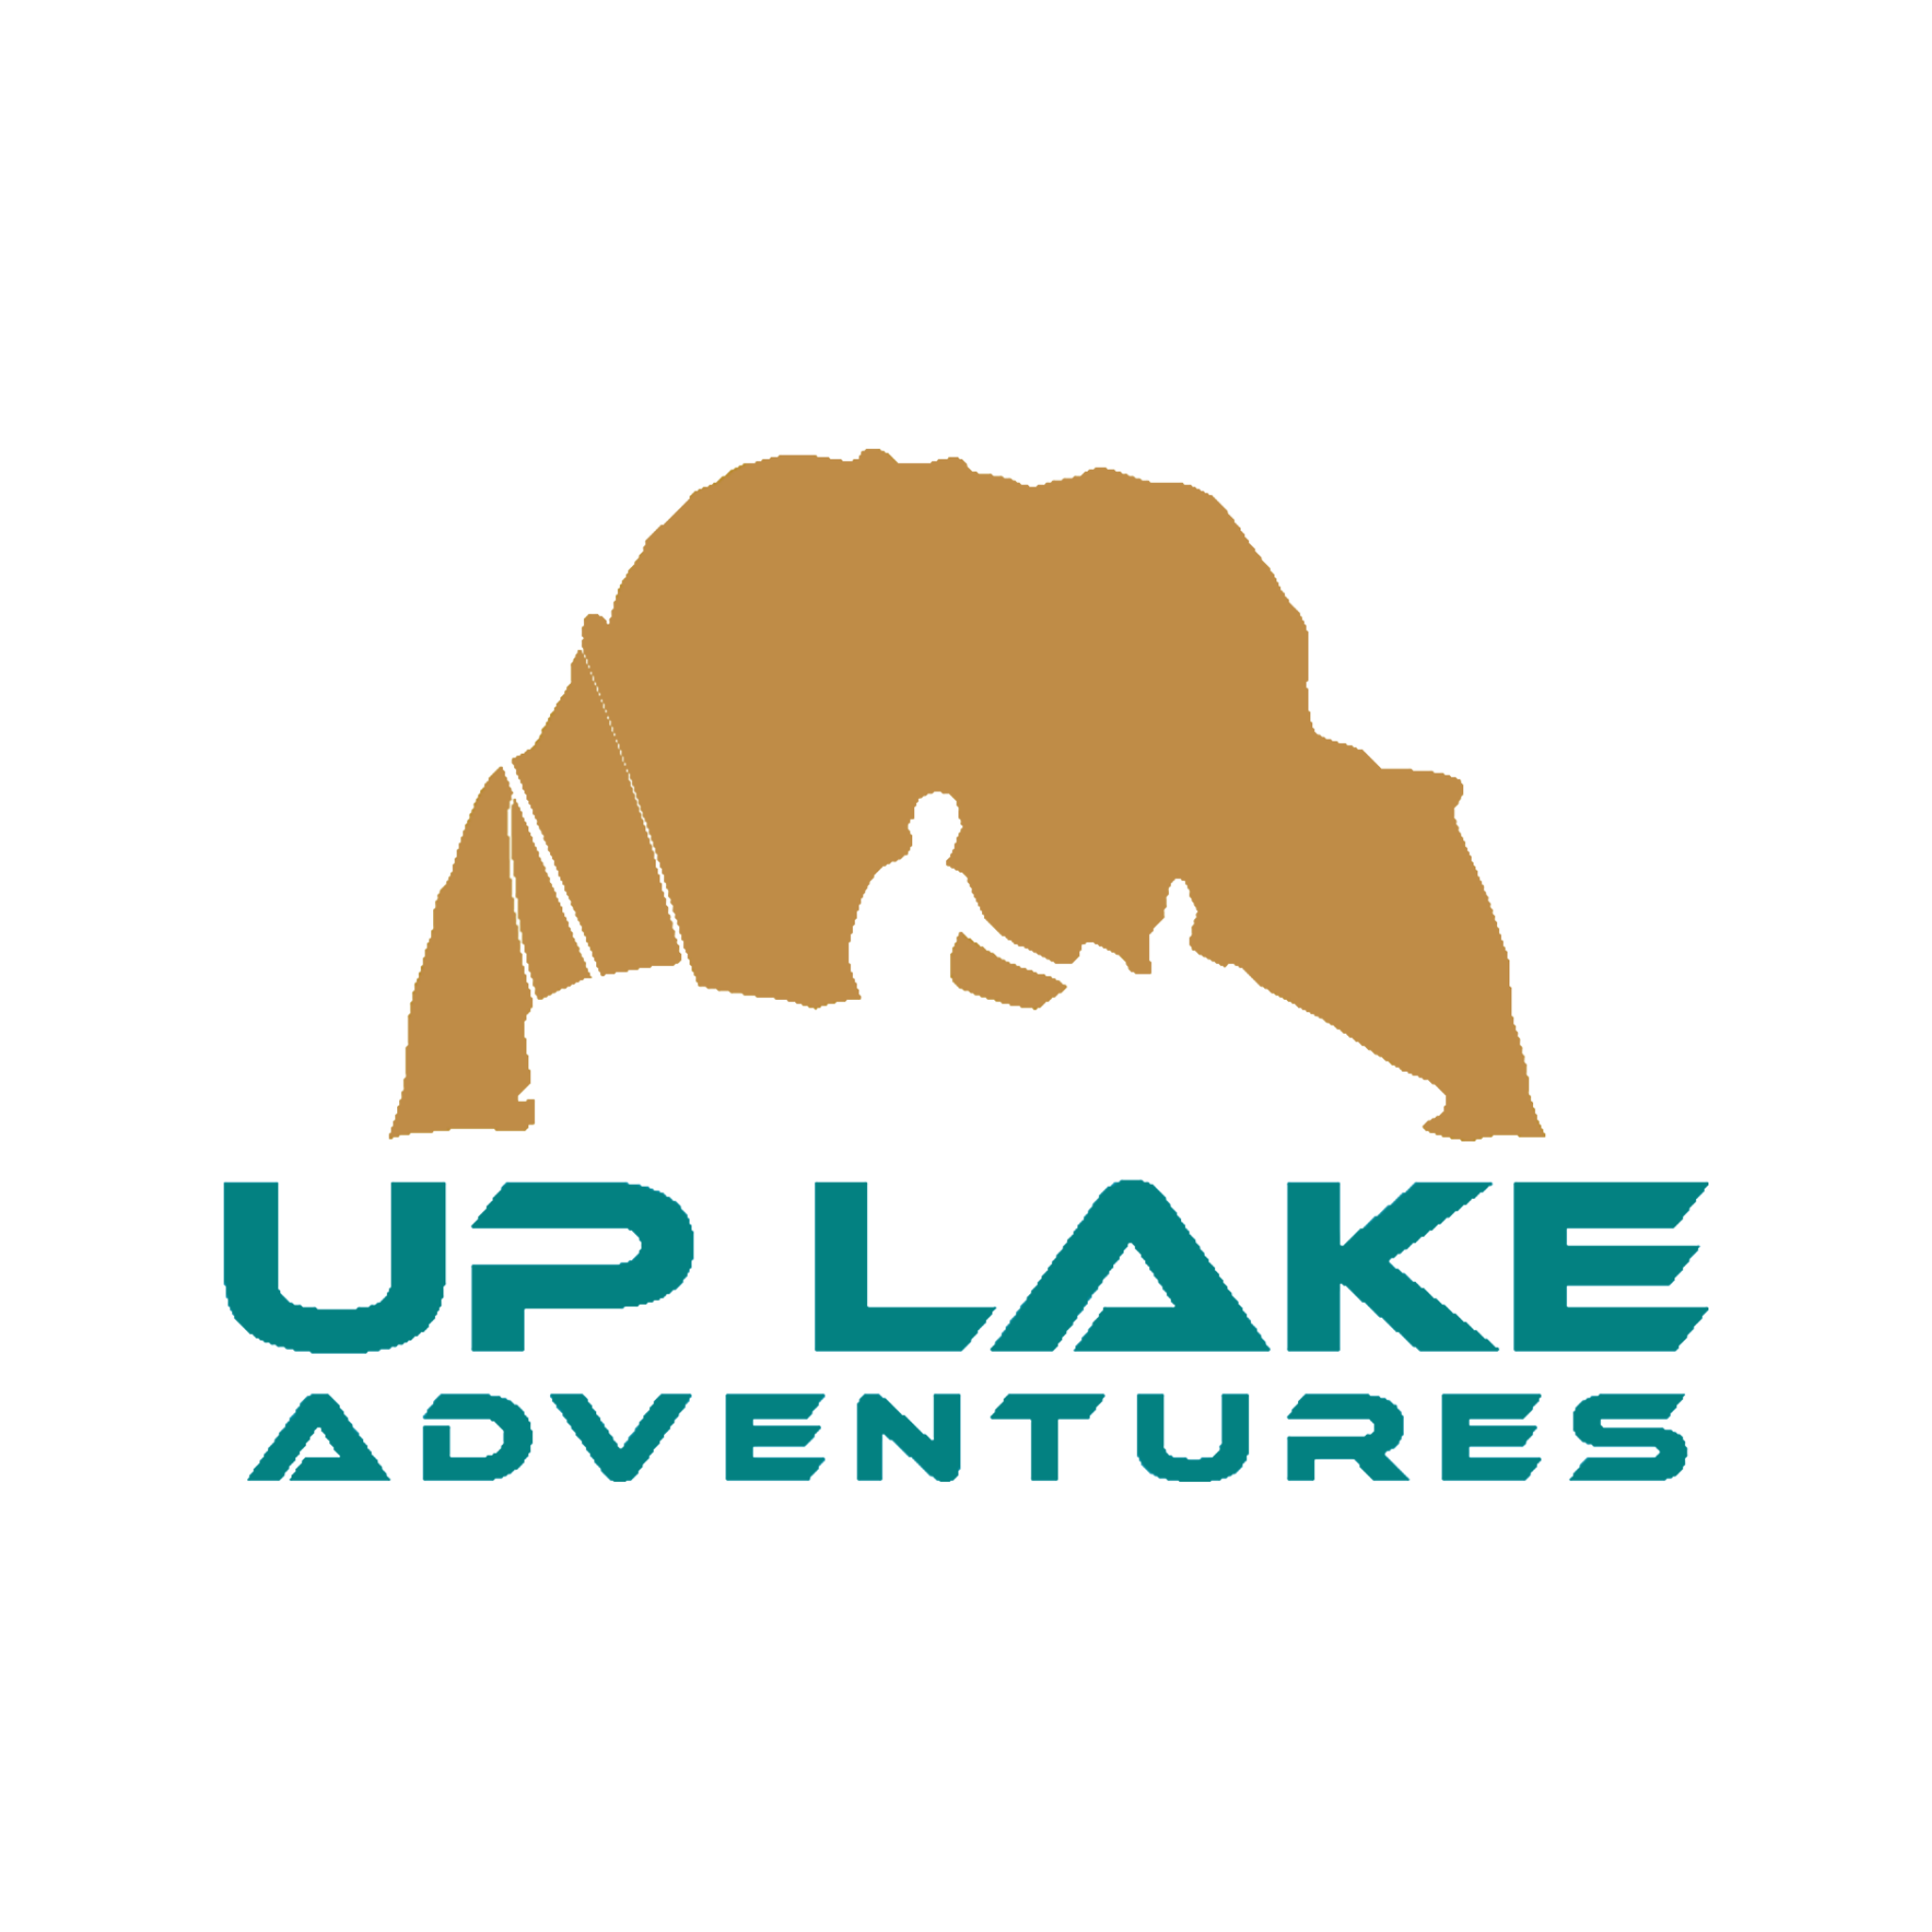 Up Lake Adventures, LLC